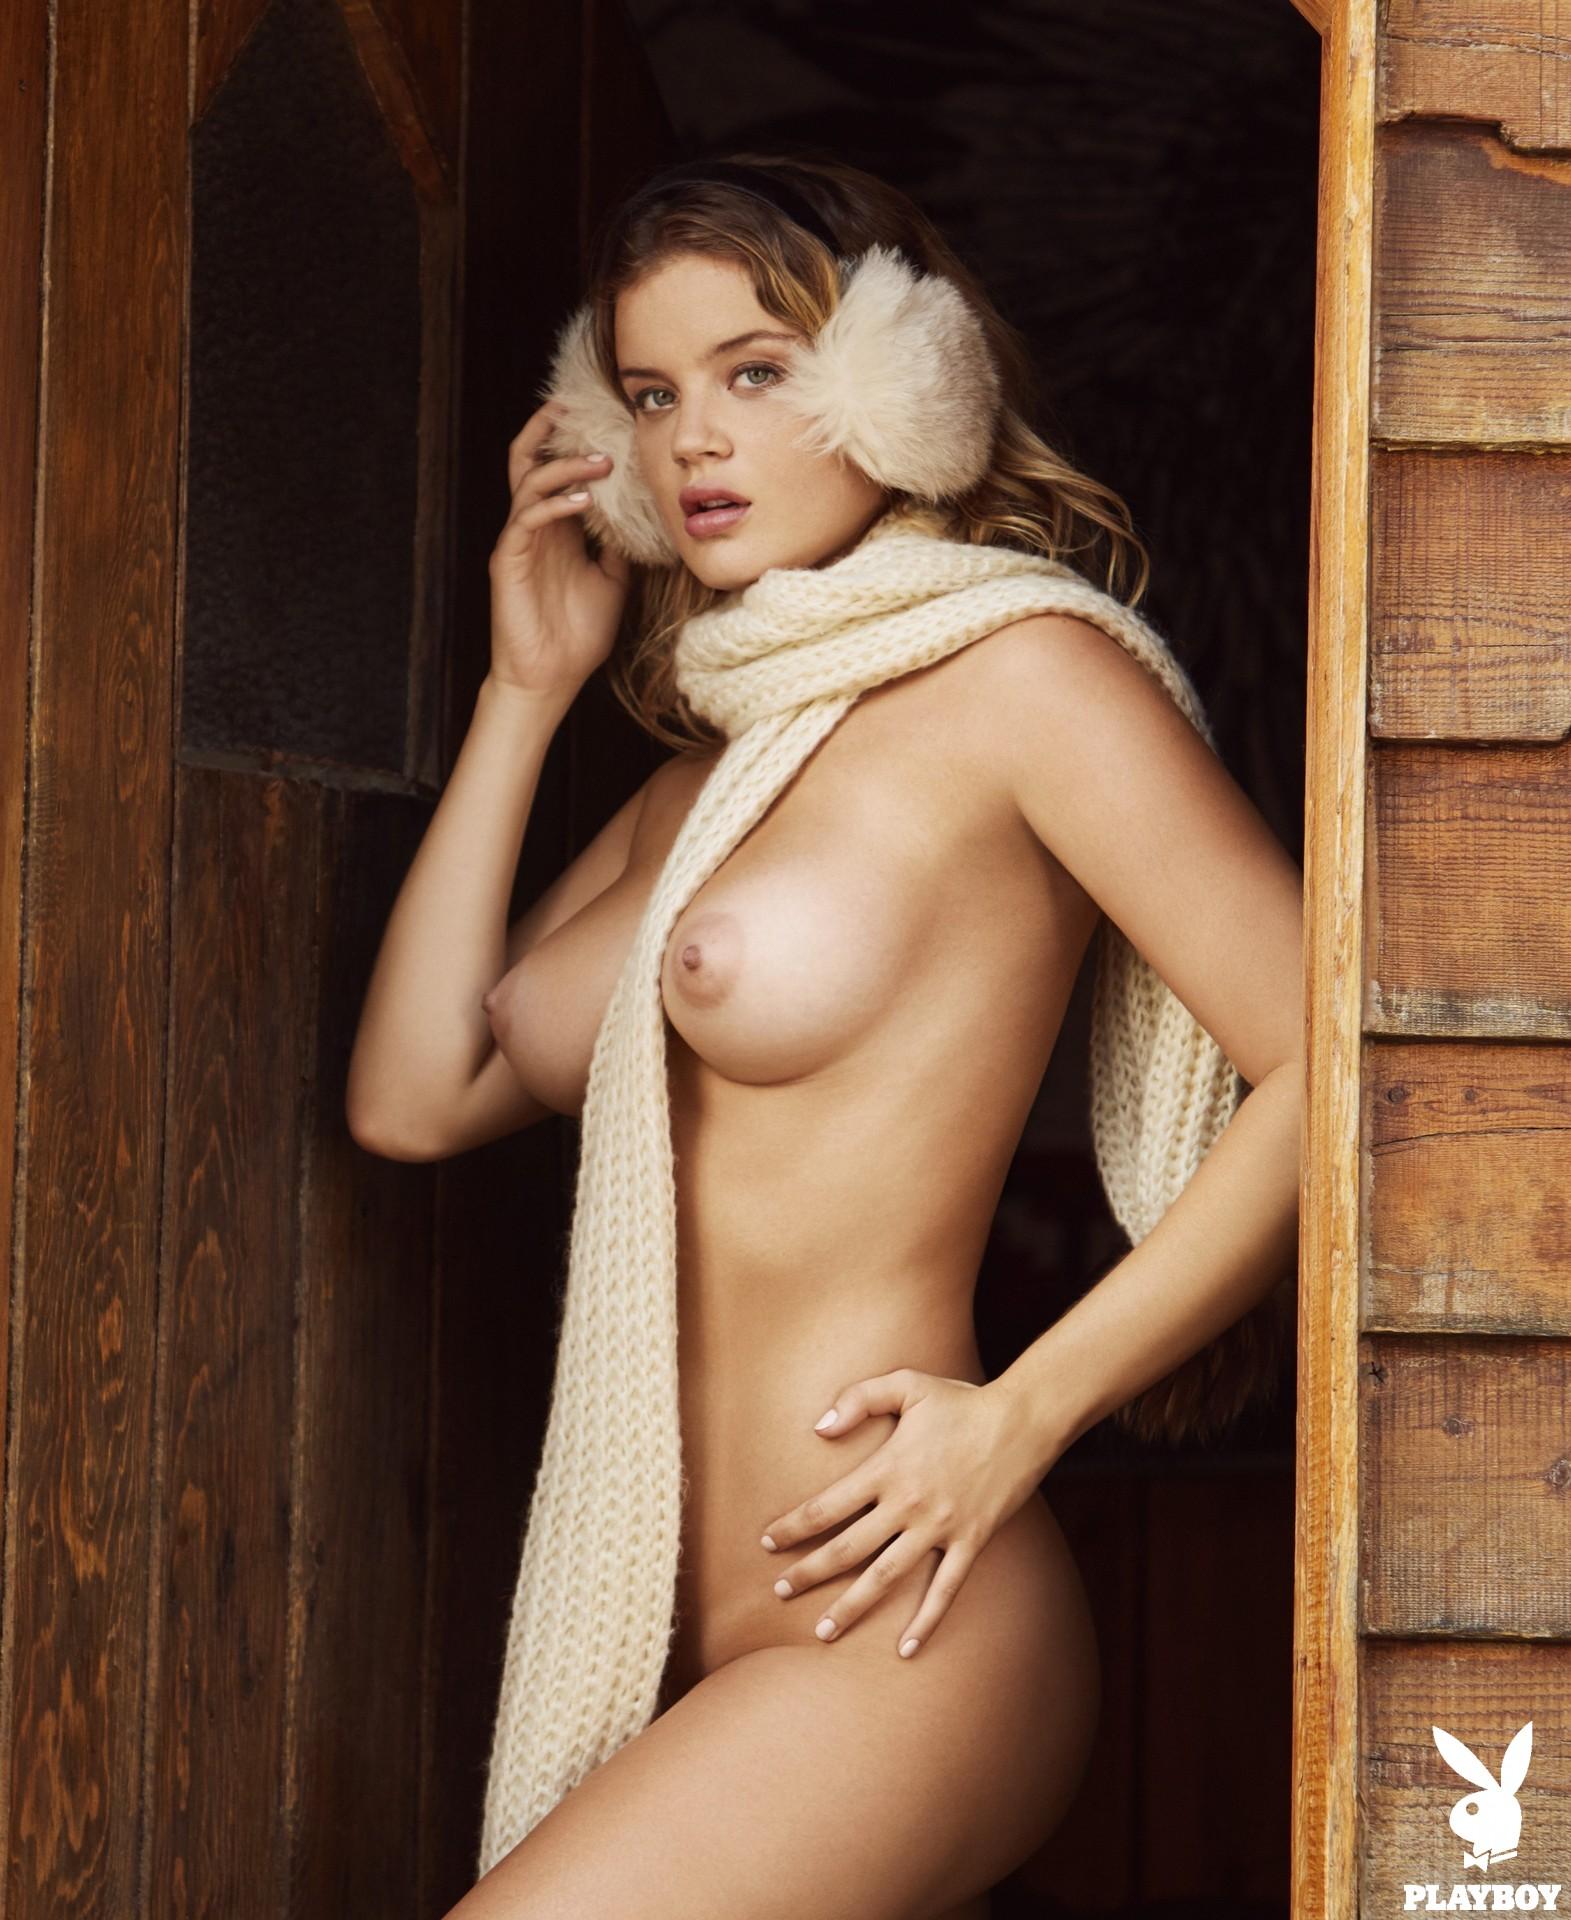 Playmate November 2018 Shelby Rose Playboy Plus (4)